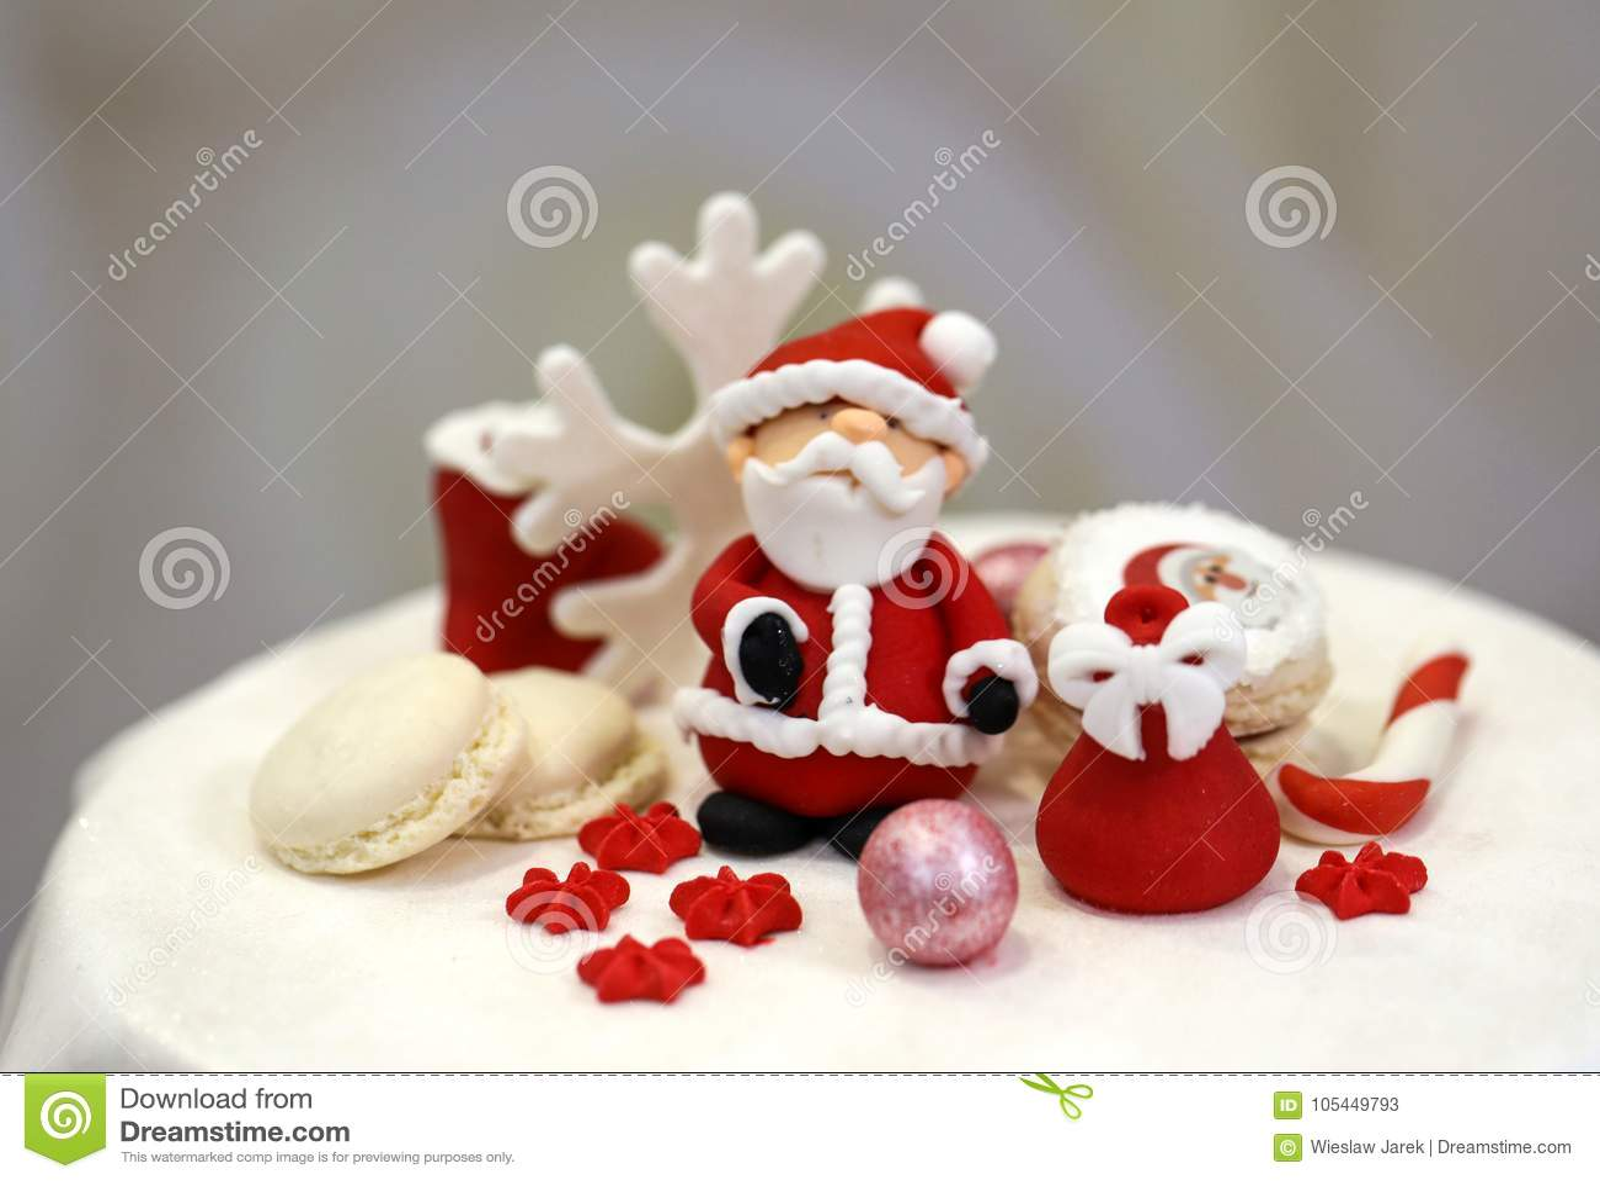 Sweet Sugar Santa Claus And Decorated Christmas Cookies Stock Image